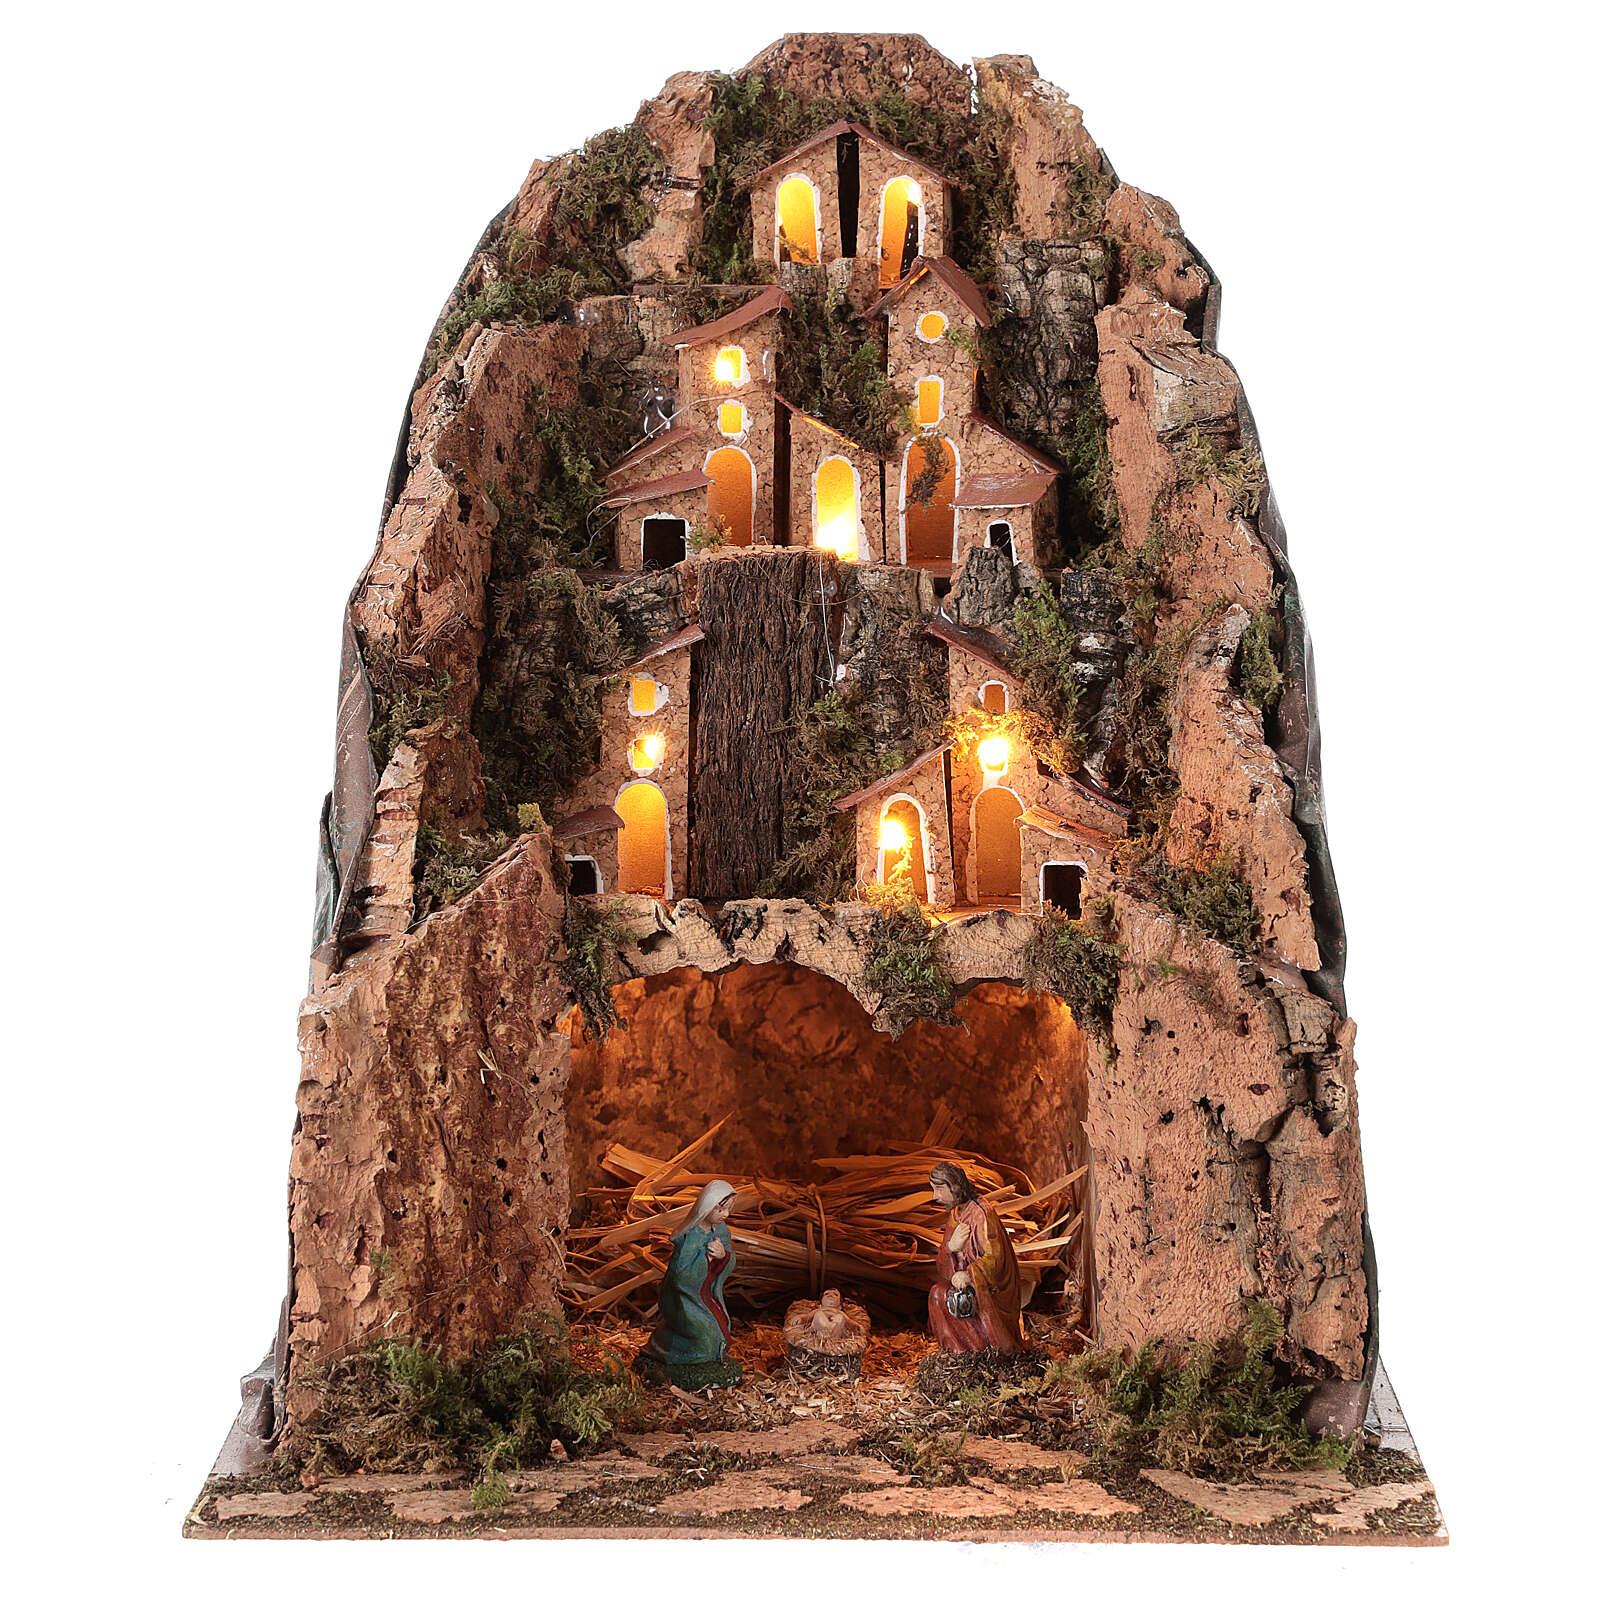 Illuminated village 30x25x25 cm Nativity scene 6 cm 4